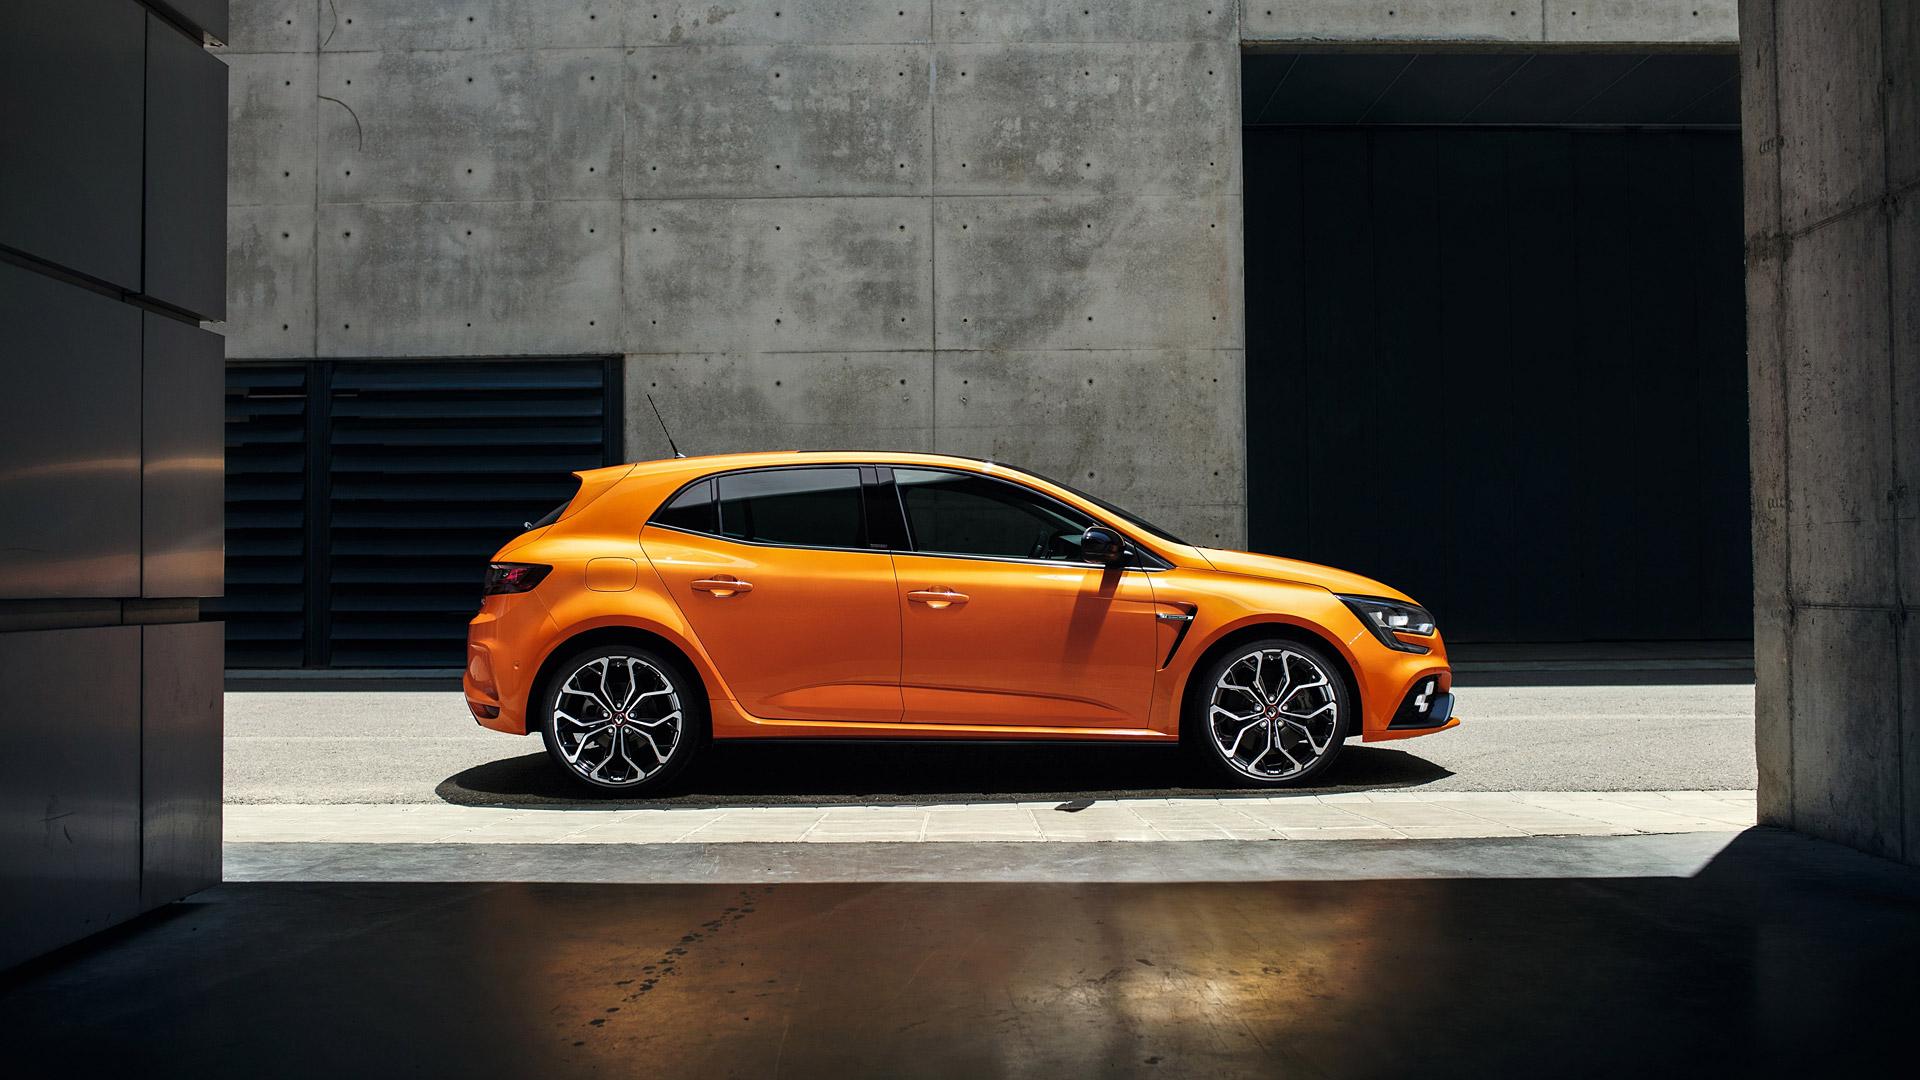 2018 Renault Megane Rs Hd Wallpaper Background Image 1920x1080 Hd wallpaper renault megane orange car